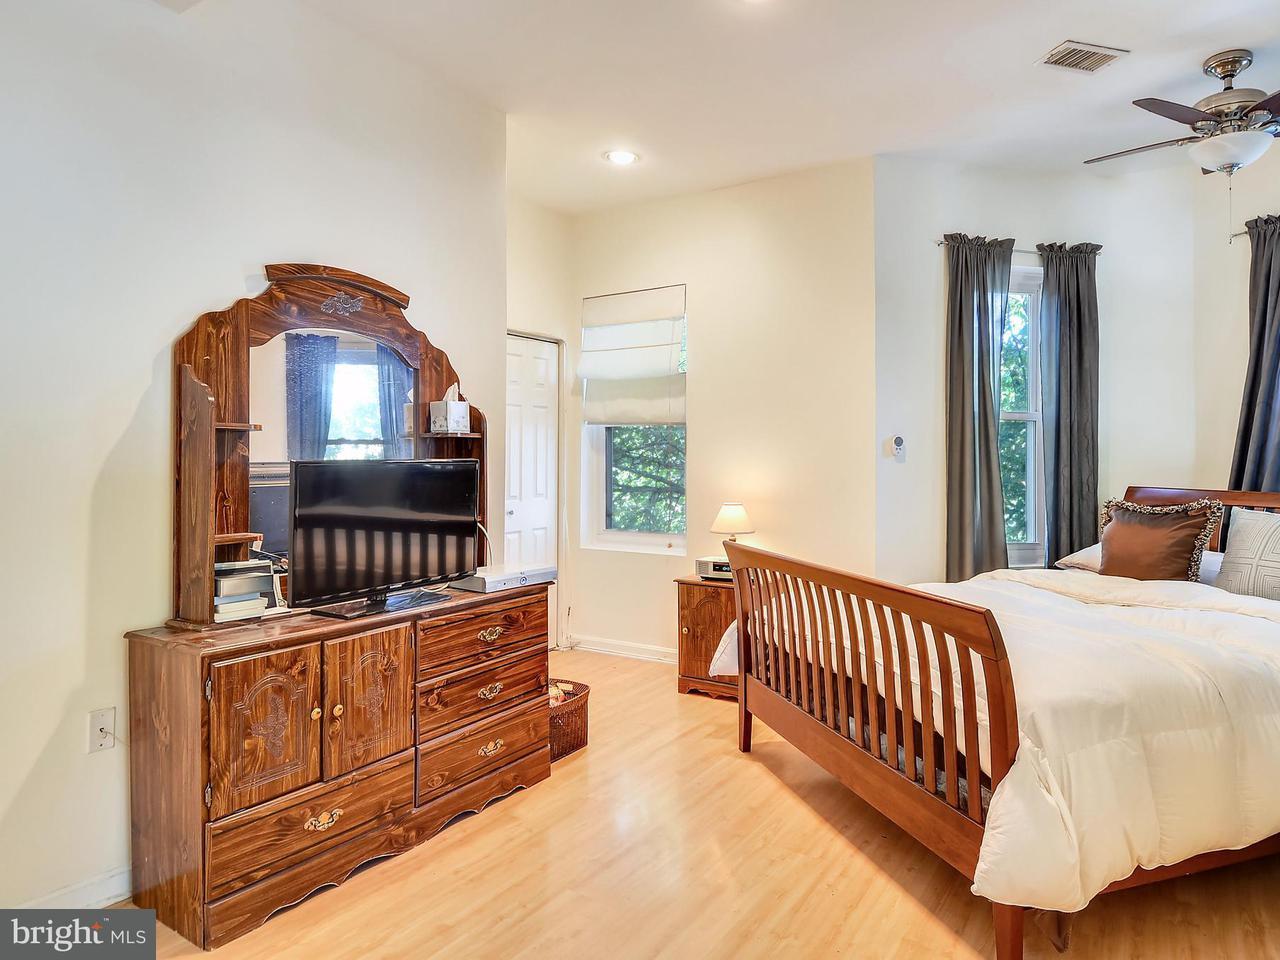 Additional photo for property listing at 1201 F St Ne 1201 F St Ne Washington, District Of Columbia 20002 Verenigde Staten